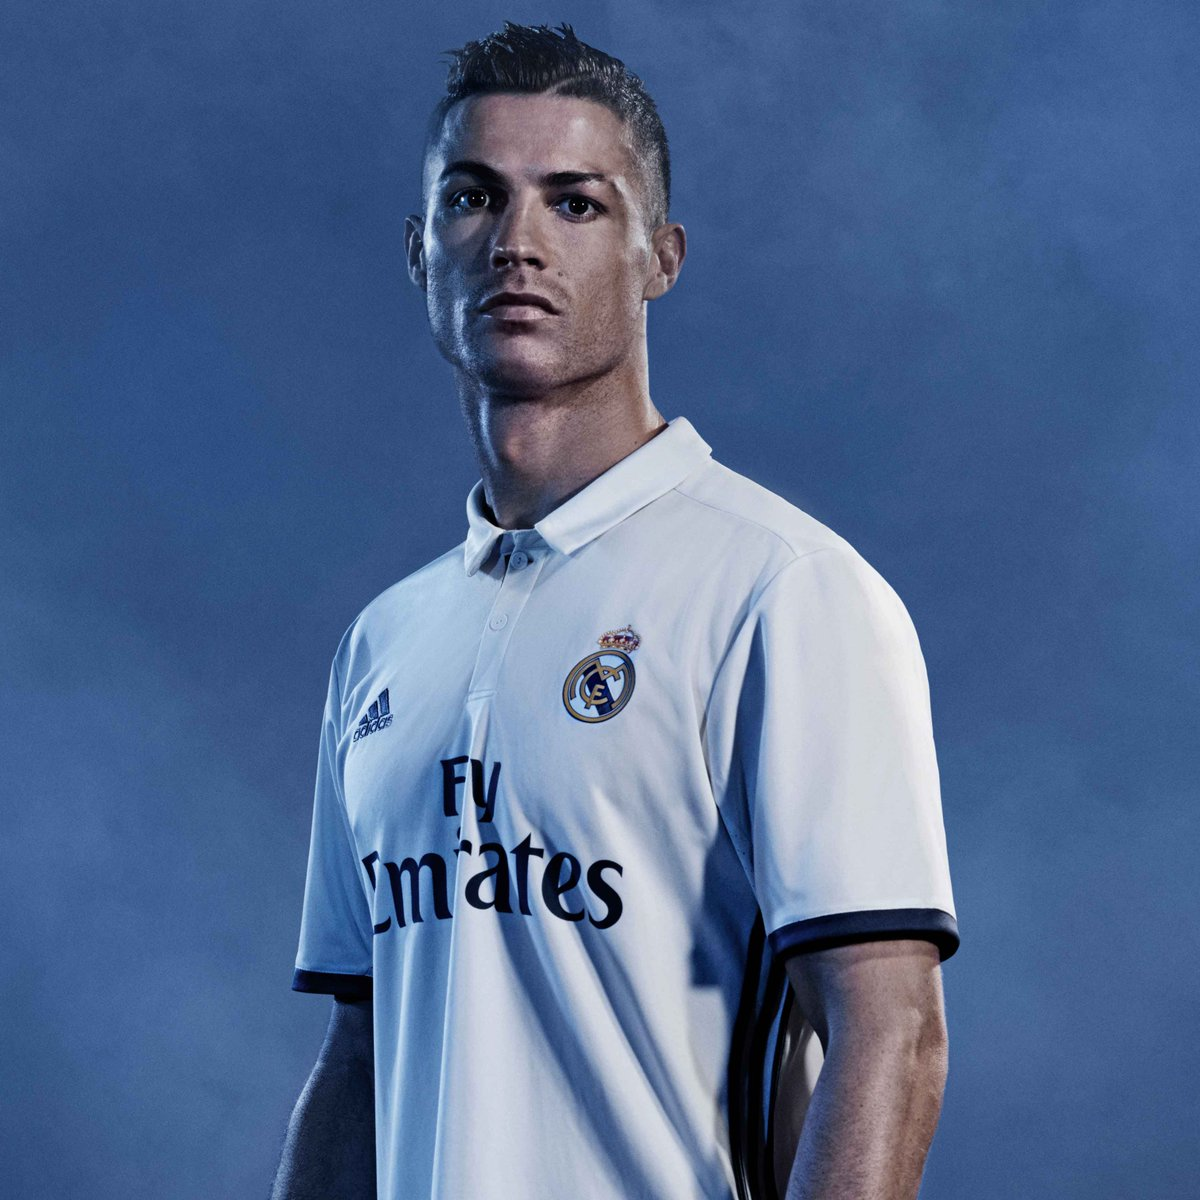 Equipacion Real Madrid 2016-2017 - Página 3 CnUA3LcW8AASlXE